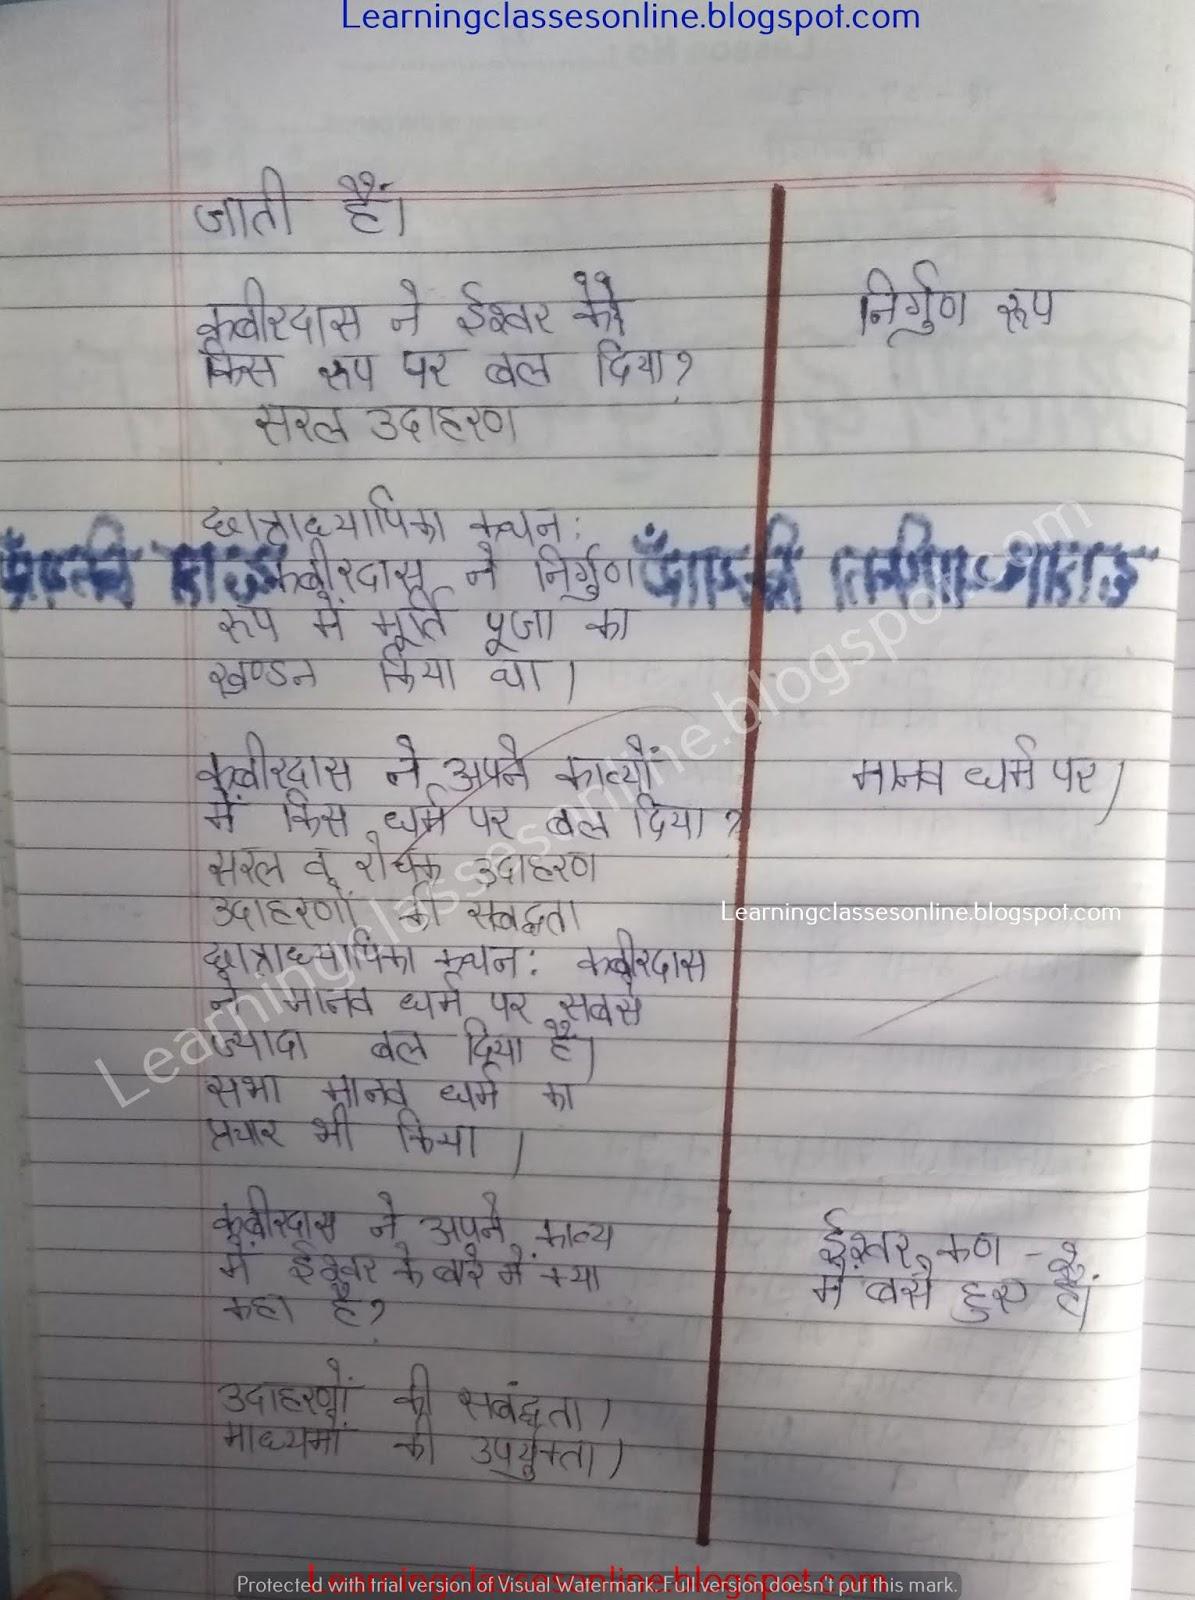 udharan sahit dristant koshal hindi lesson plan free download pdf